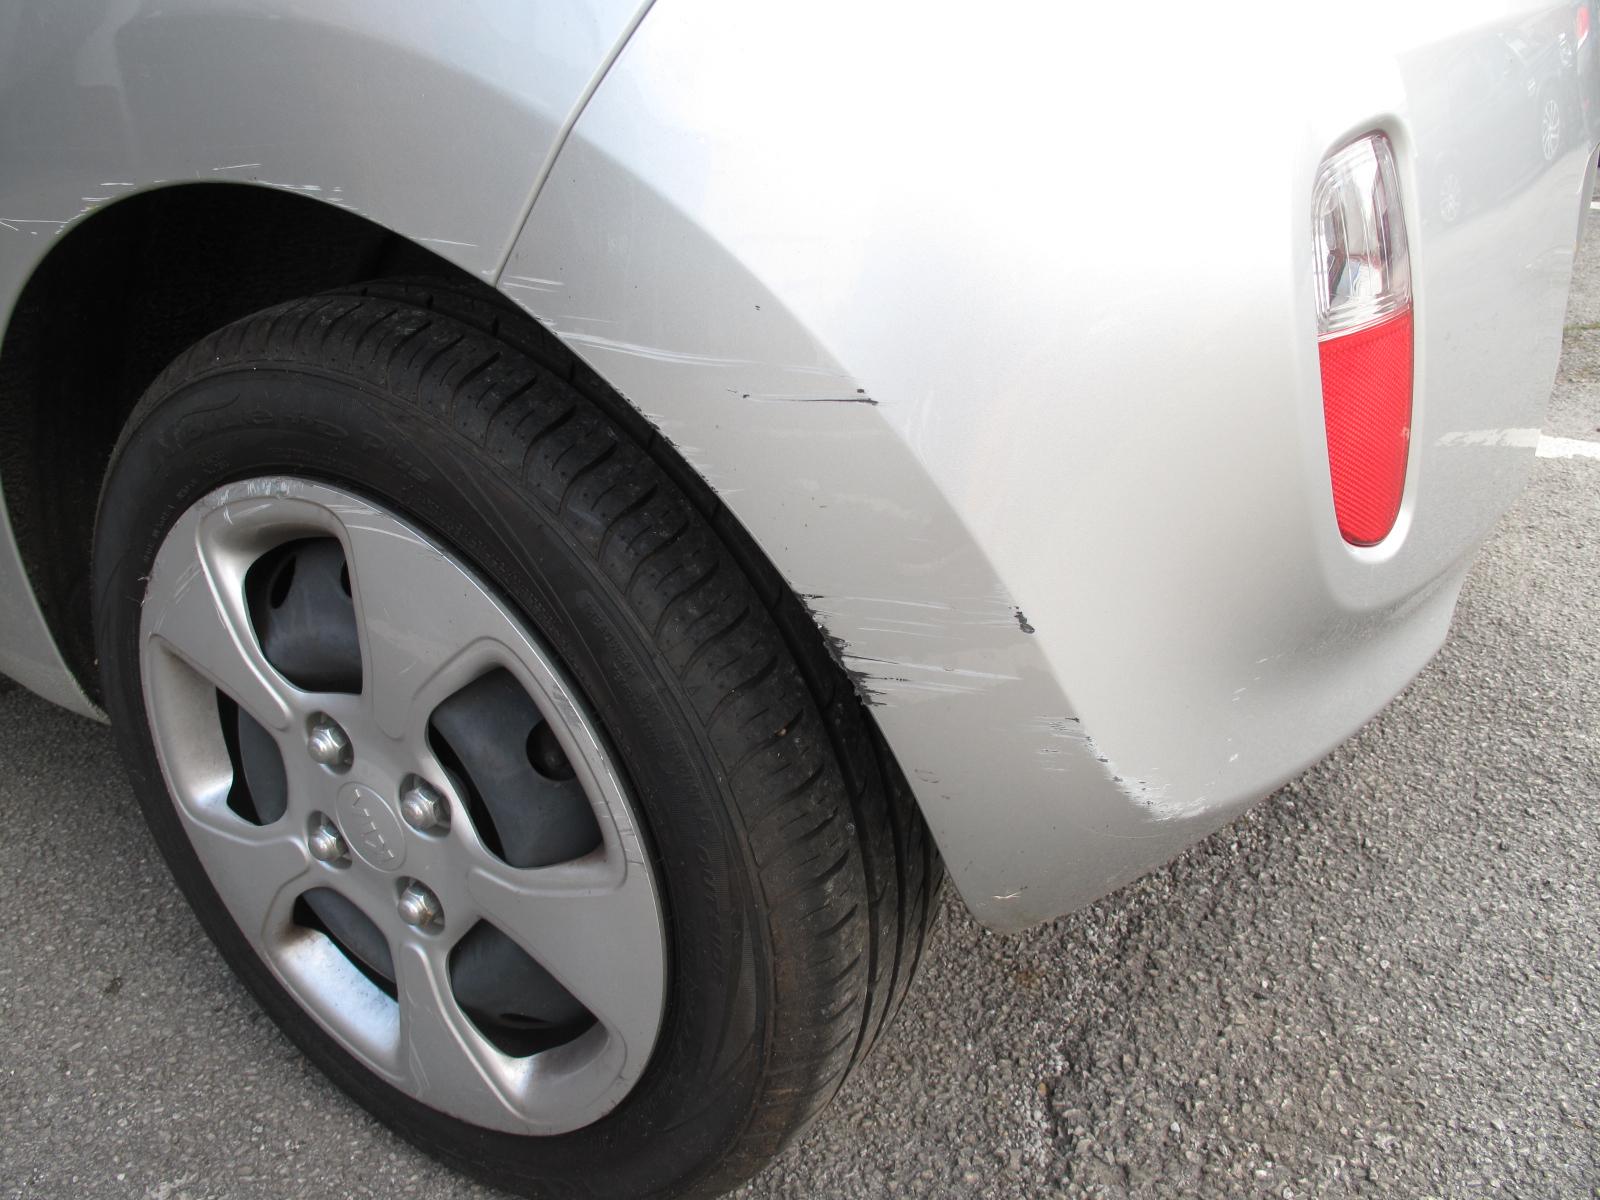 [YR12 YCN] 2012 Kia Picanto 1.0 petrol, 5-door hatchback in Silver, 13,787 Miles, 1 previous keeper, - Image 6 of 6